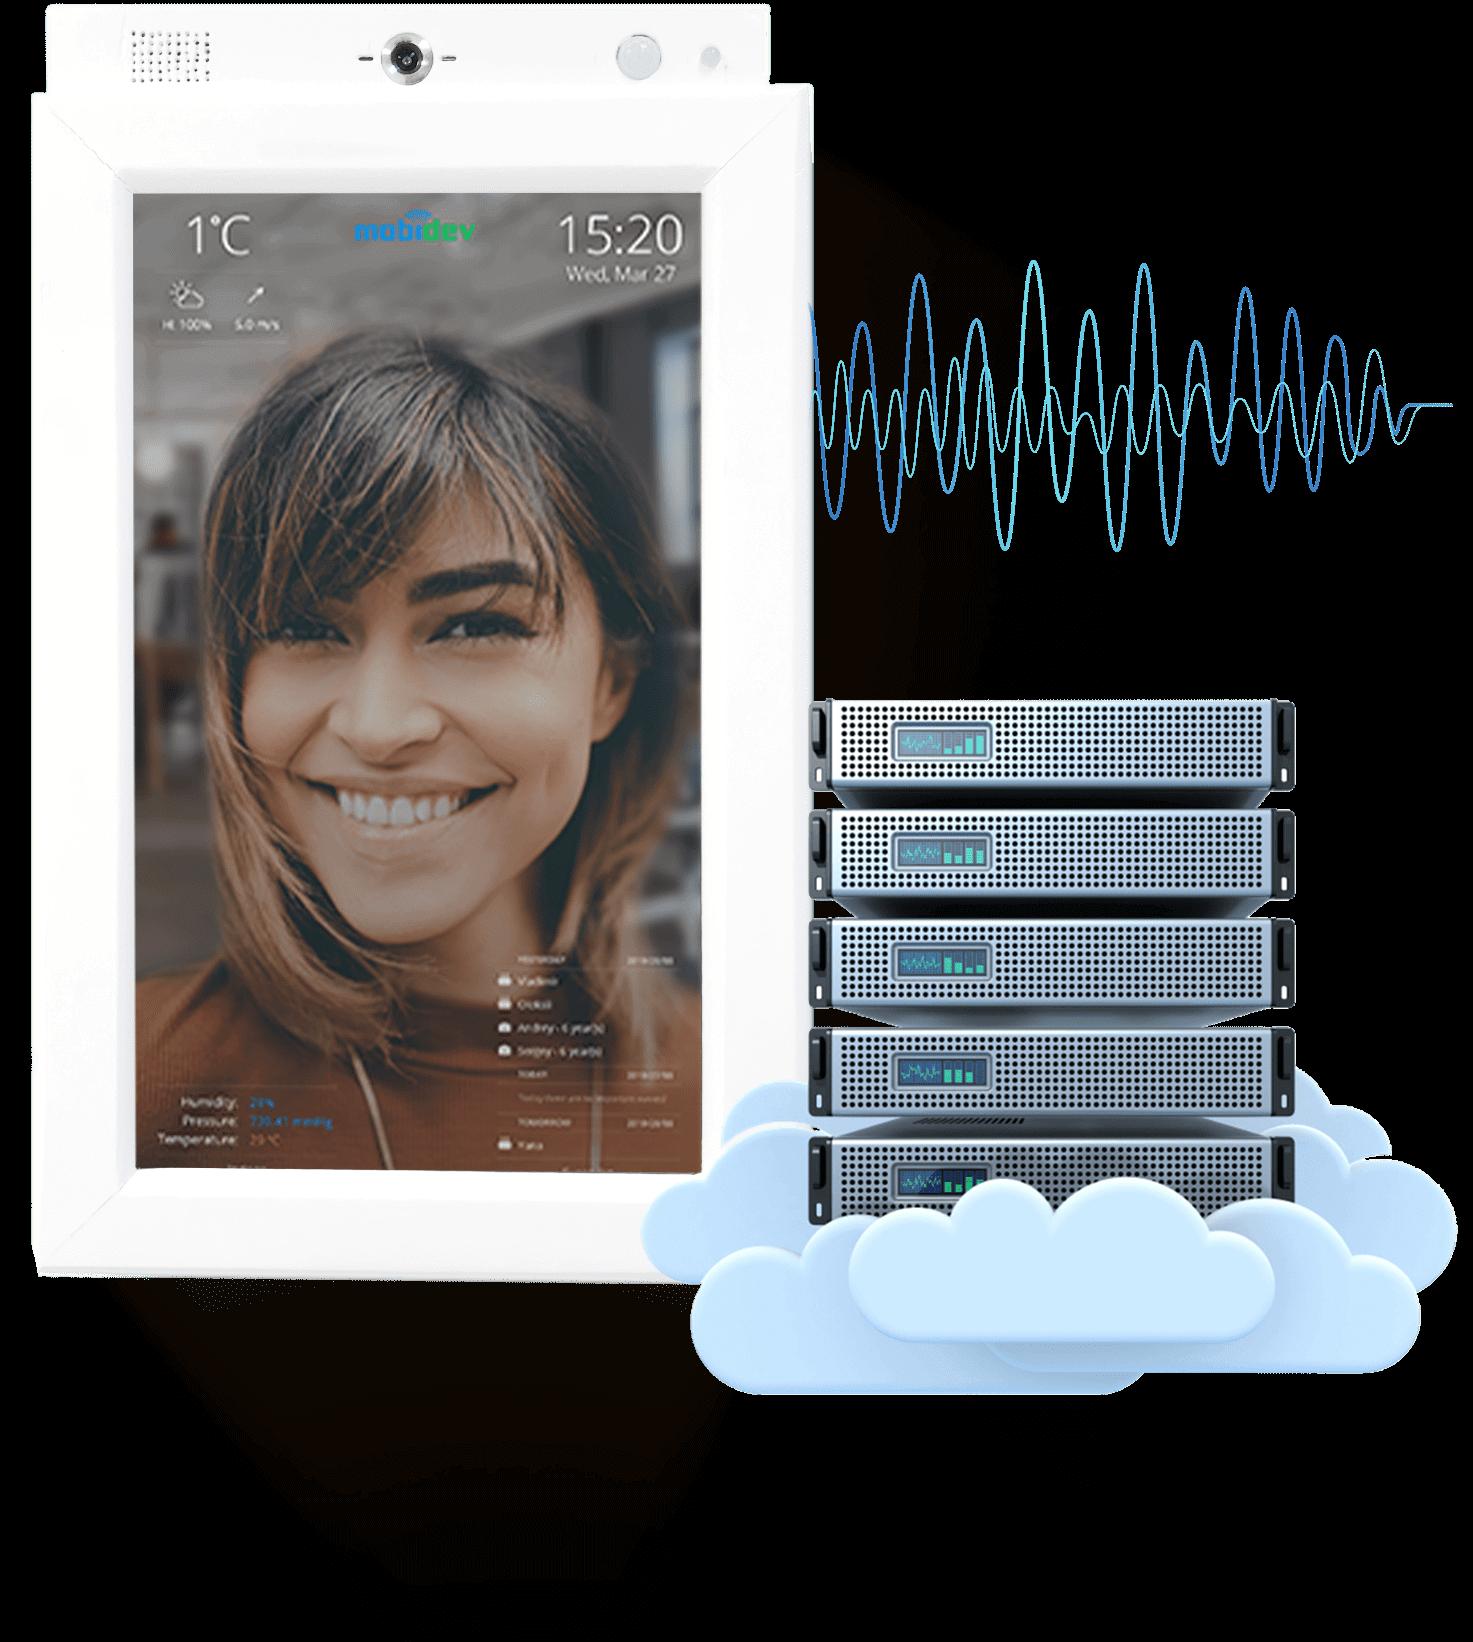 Alexa skills development for apps